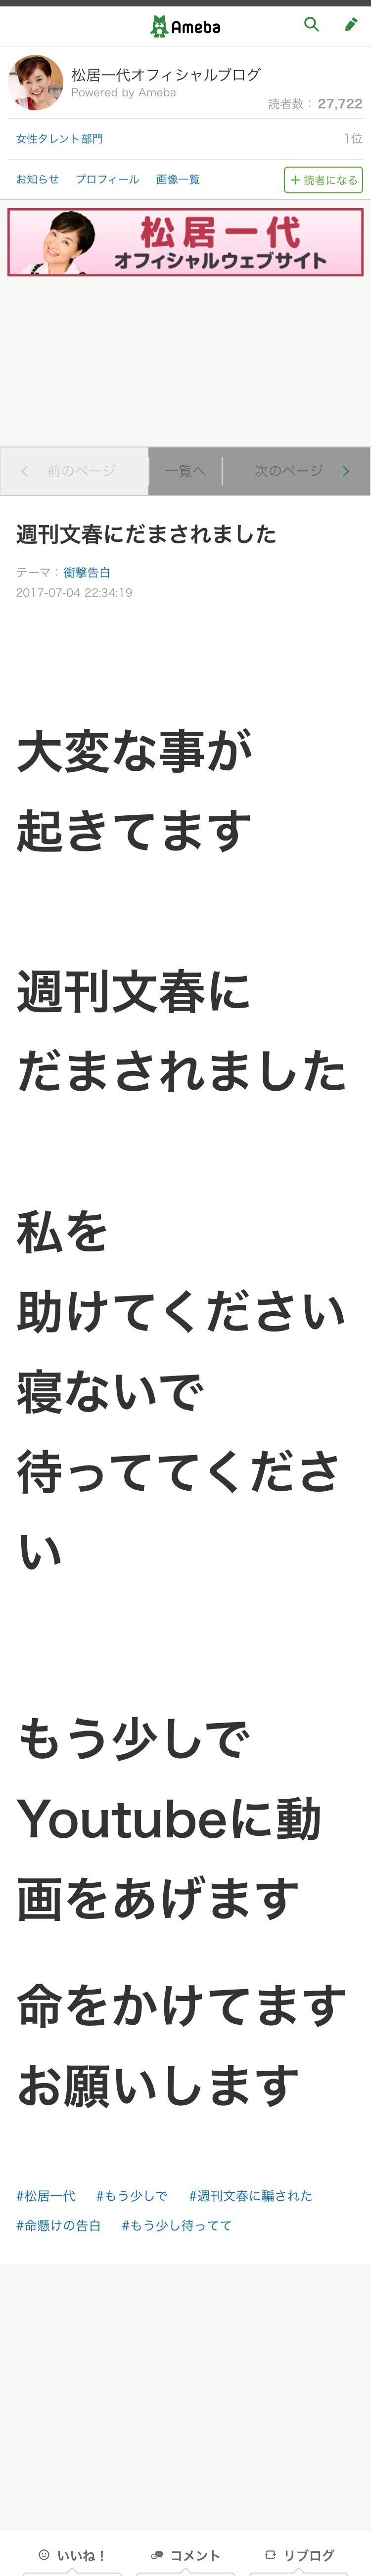 yBYGmul.jpg